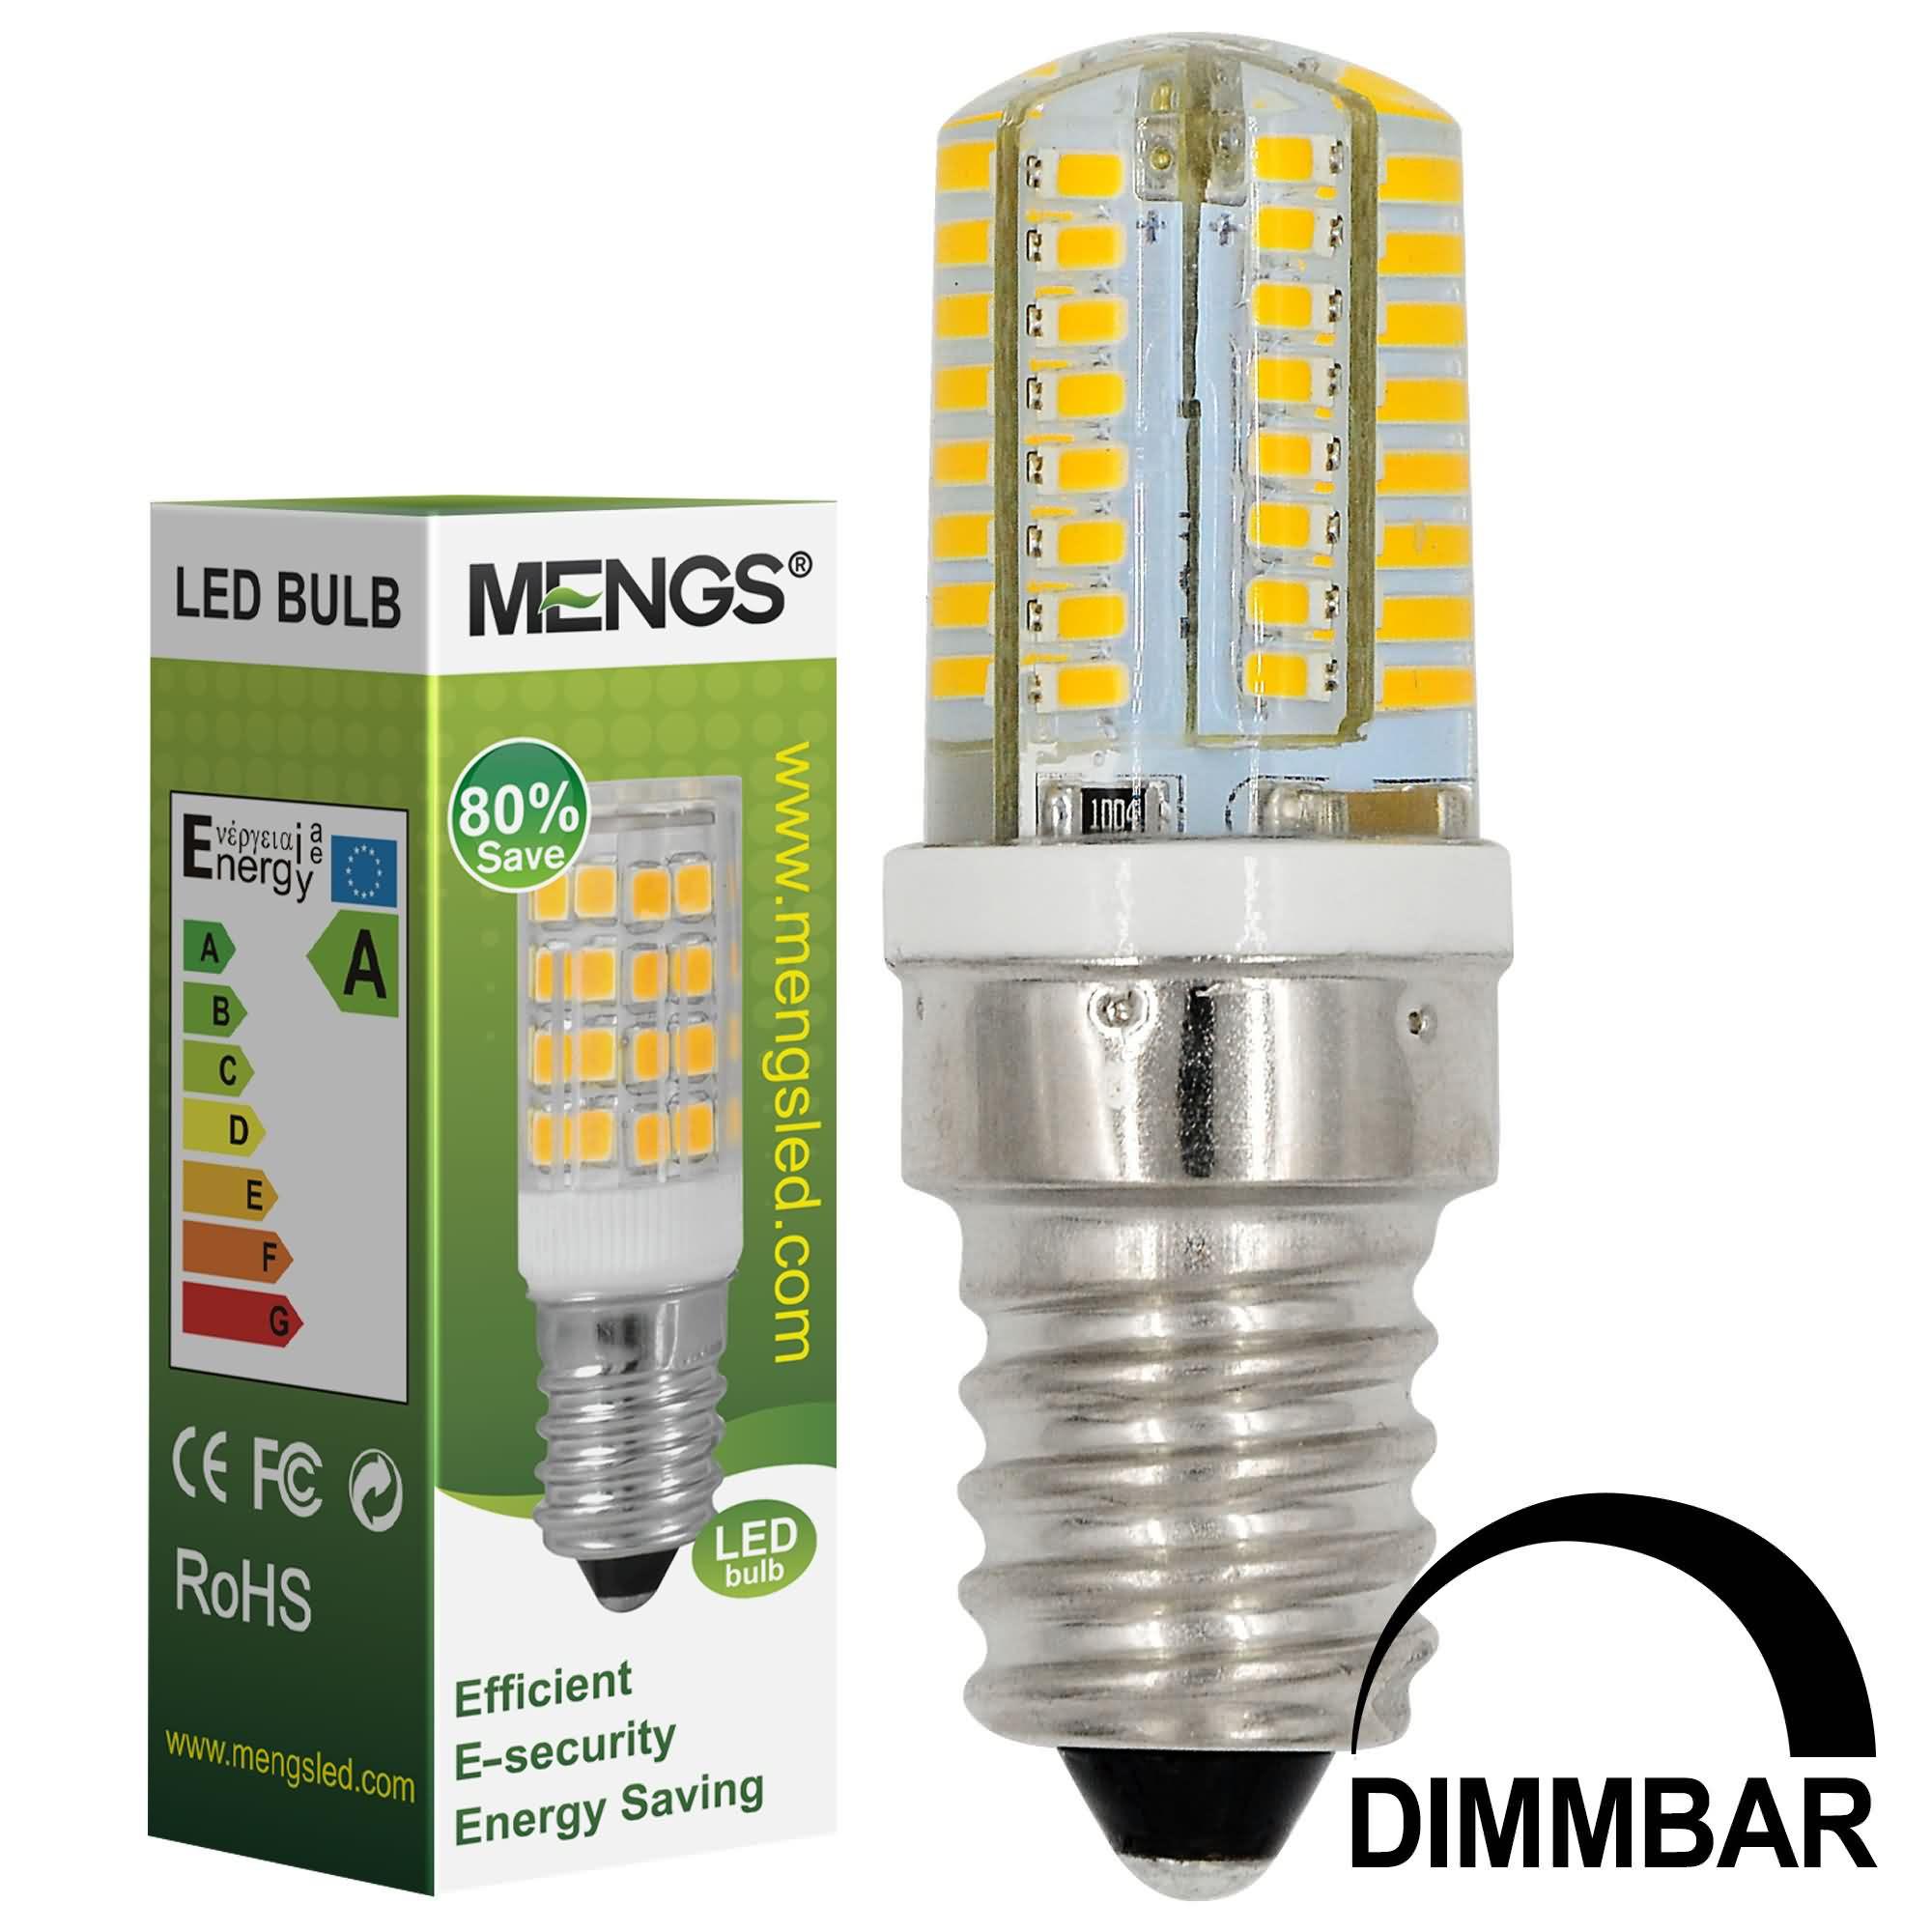 MENGS® E14 3W LED Dimmable Light 64x 3014 SMD LEDs LED Lamp in Warm White Energy-Saving Light